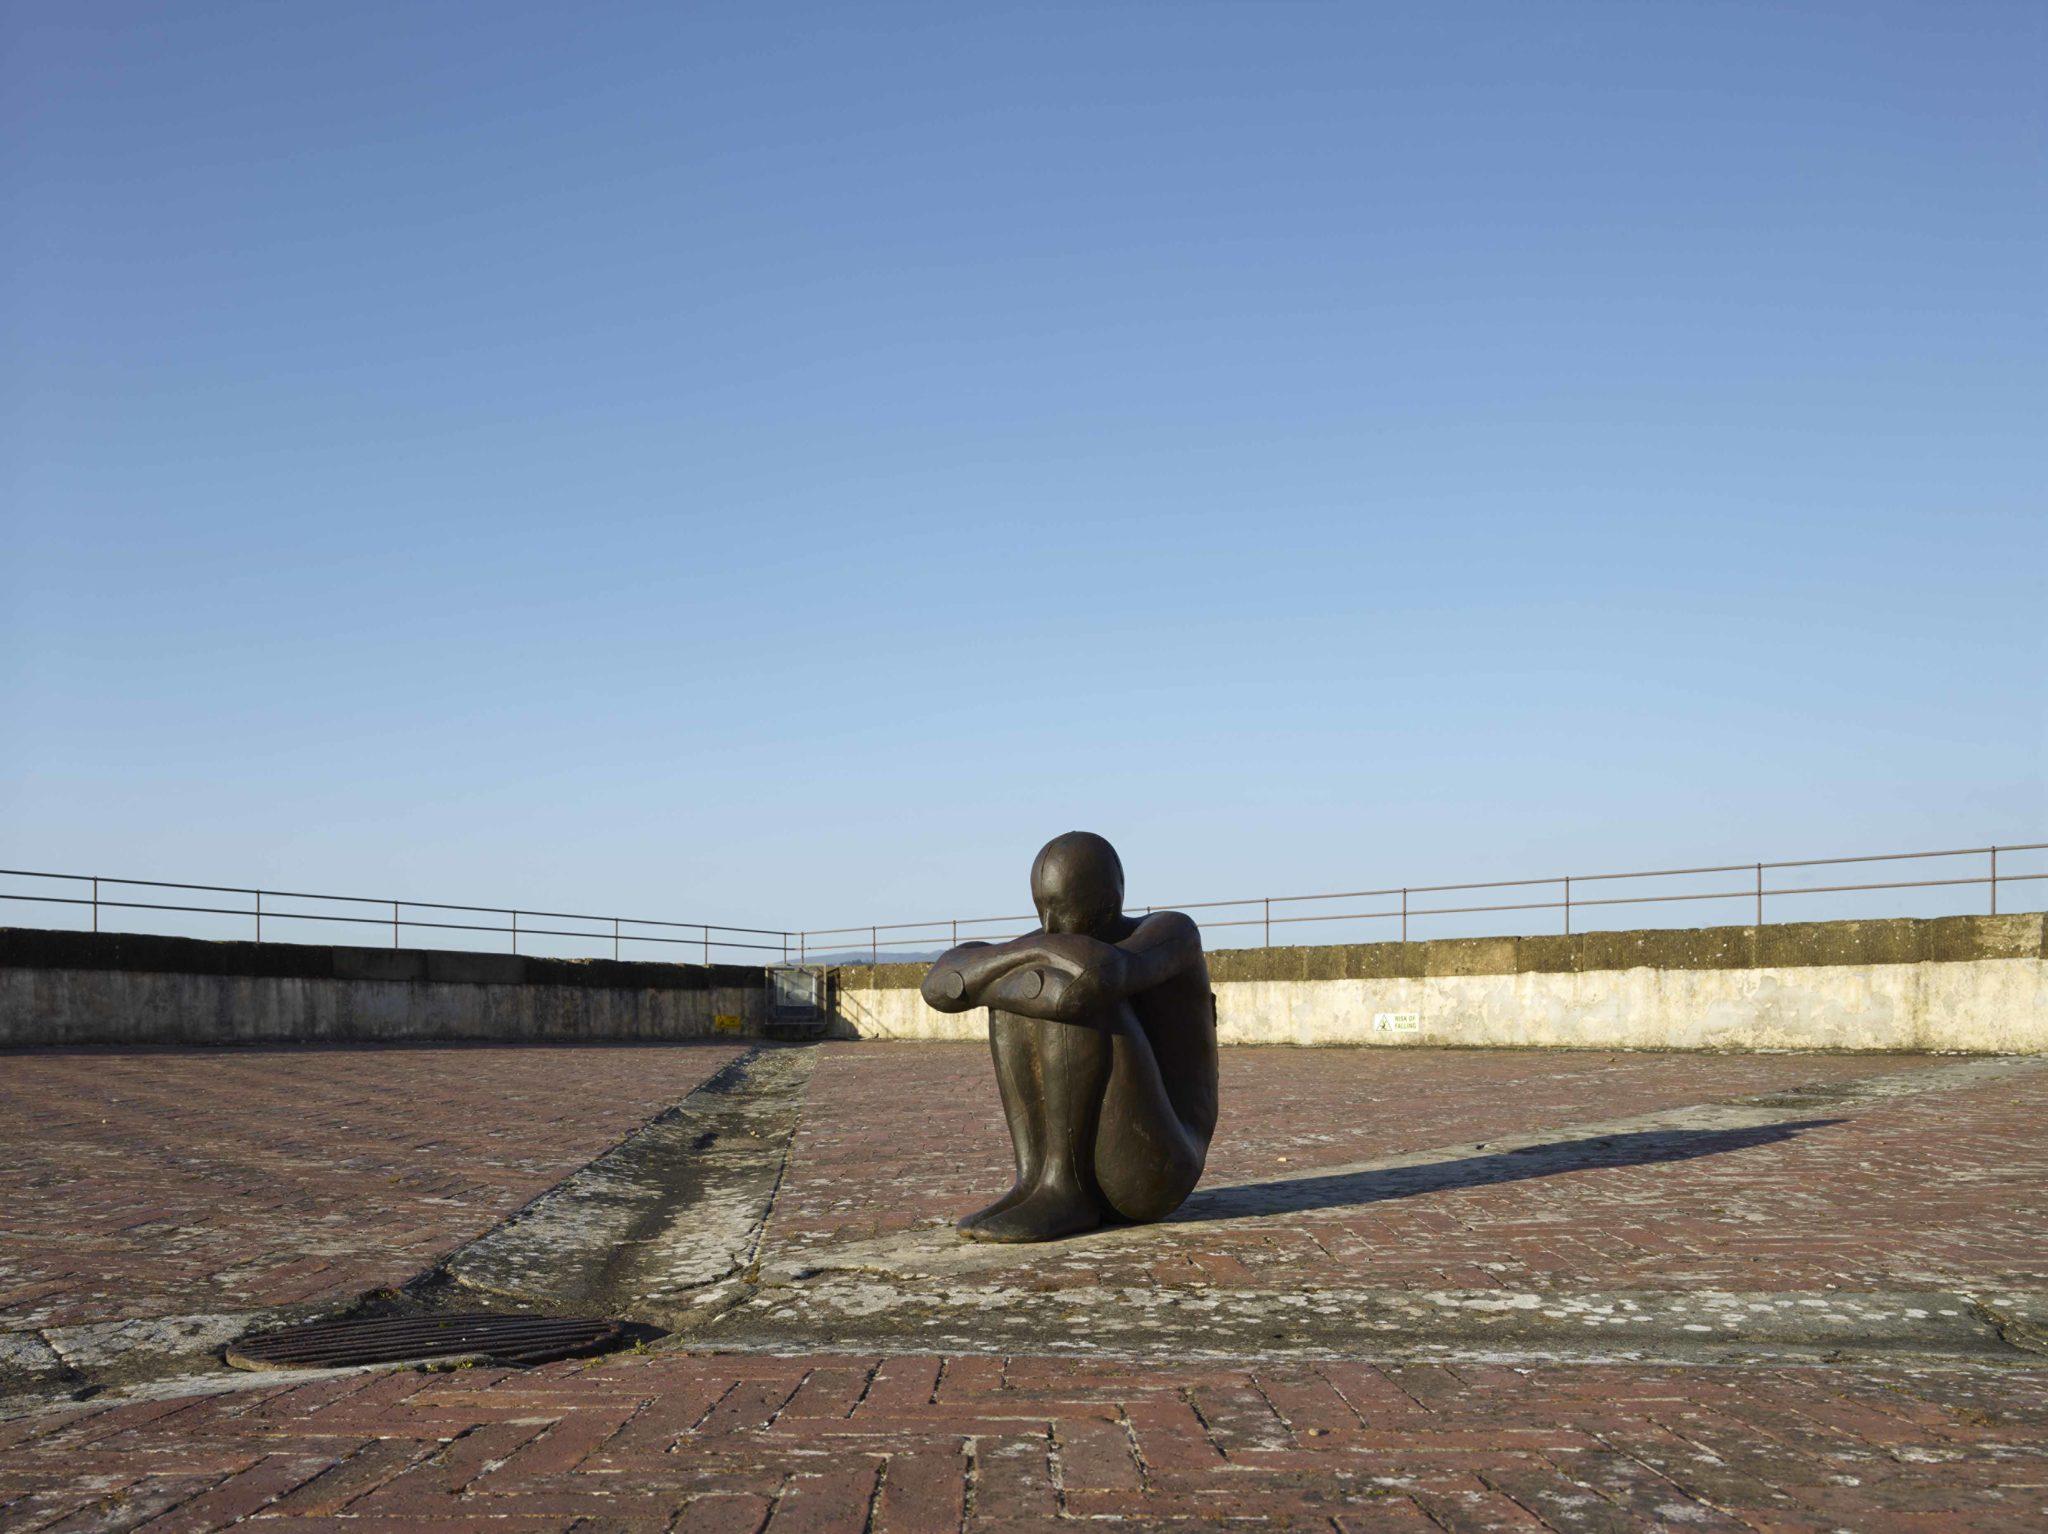 Antony Gormley a Firenze: oltre 75mila visitatori in due mesi